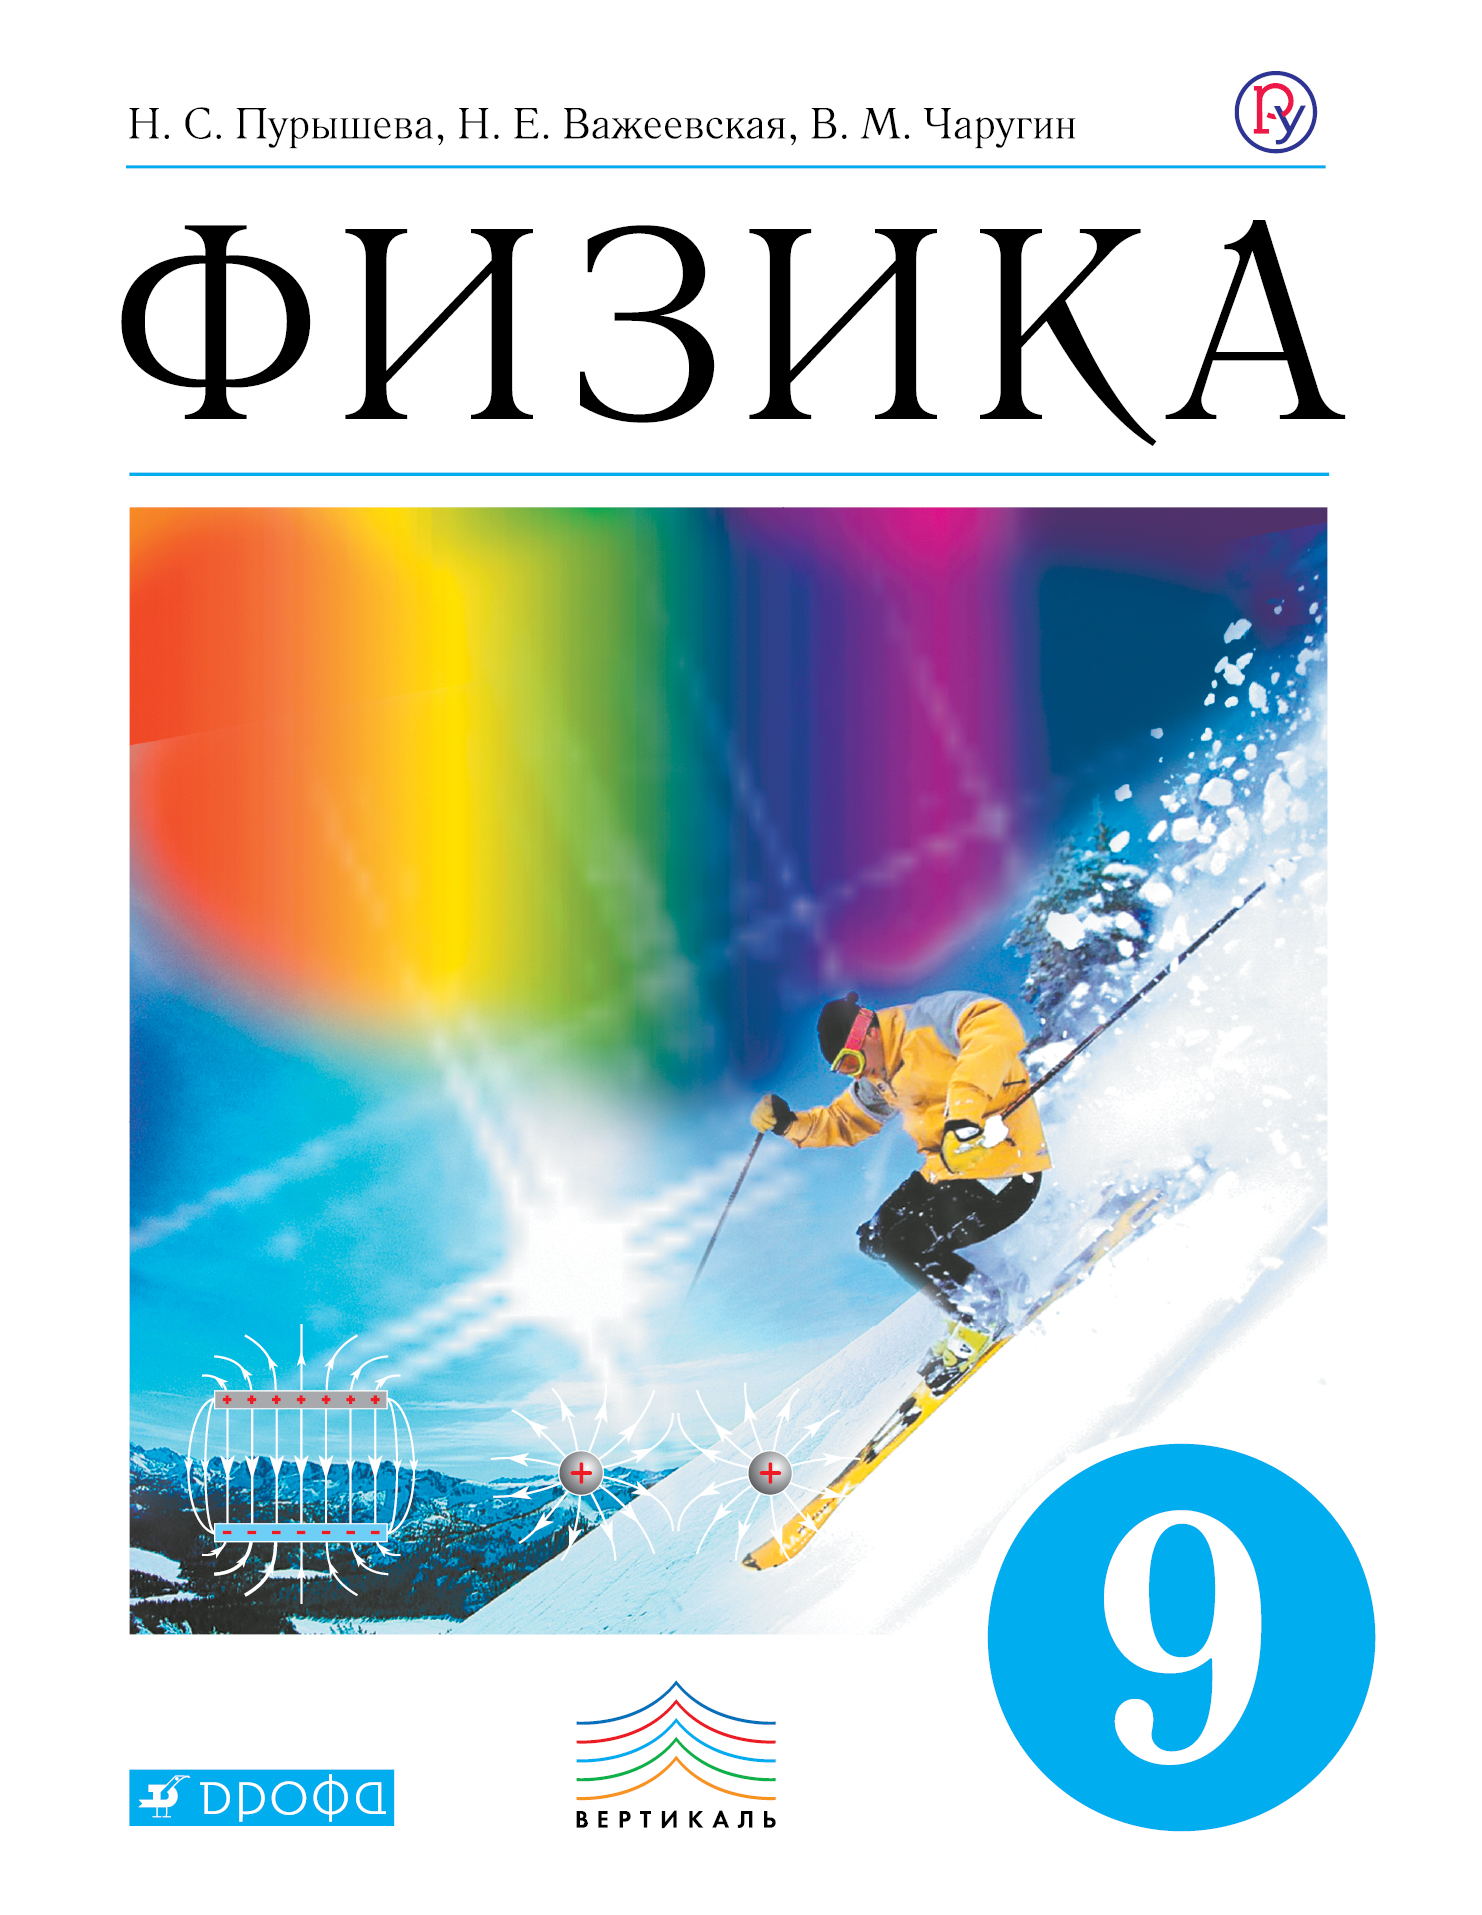 Пурышева Н.С., Важеевская Н.Е., Чаругин В.М. Физика. 9 класс. Учебник. александр русаков физика колебания и волны